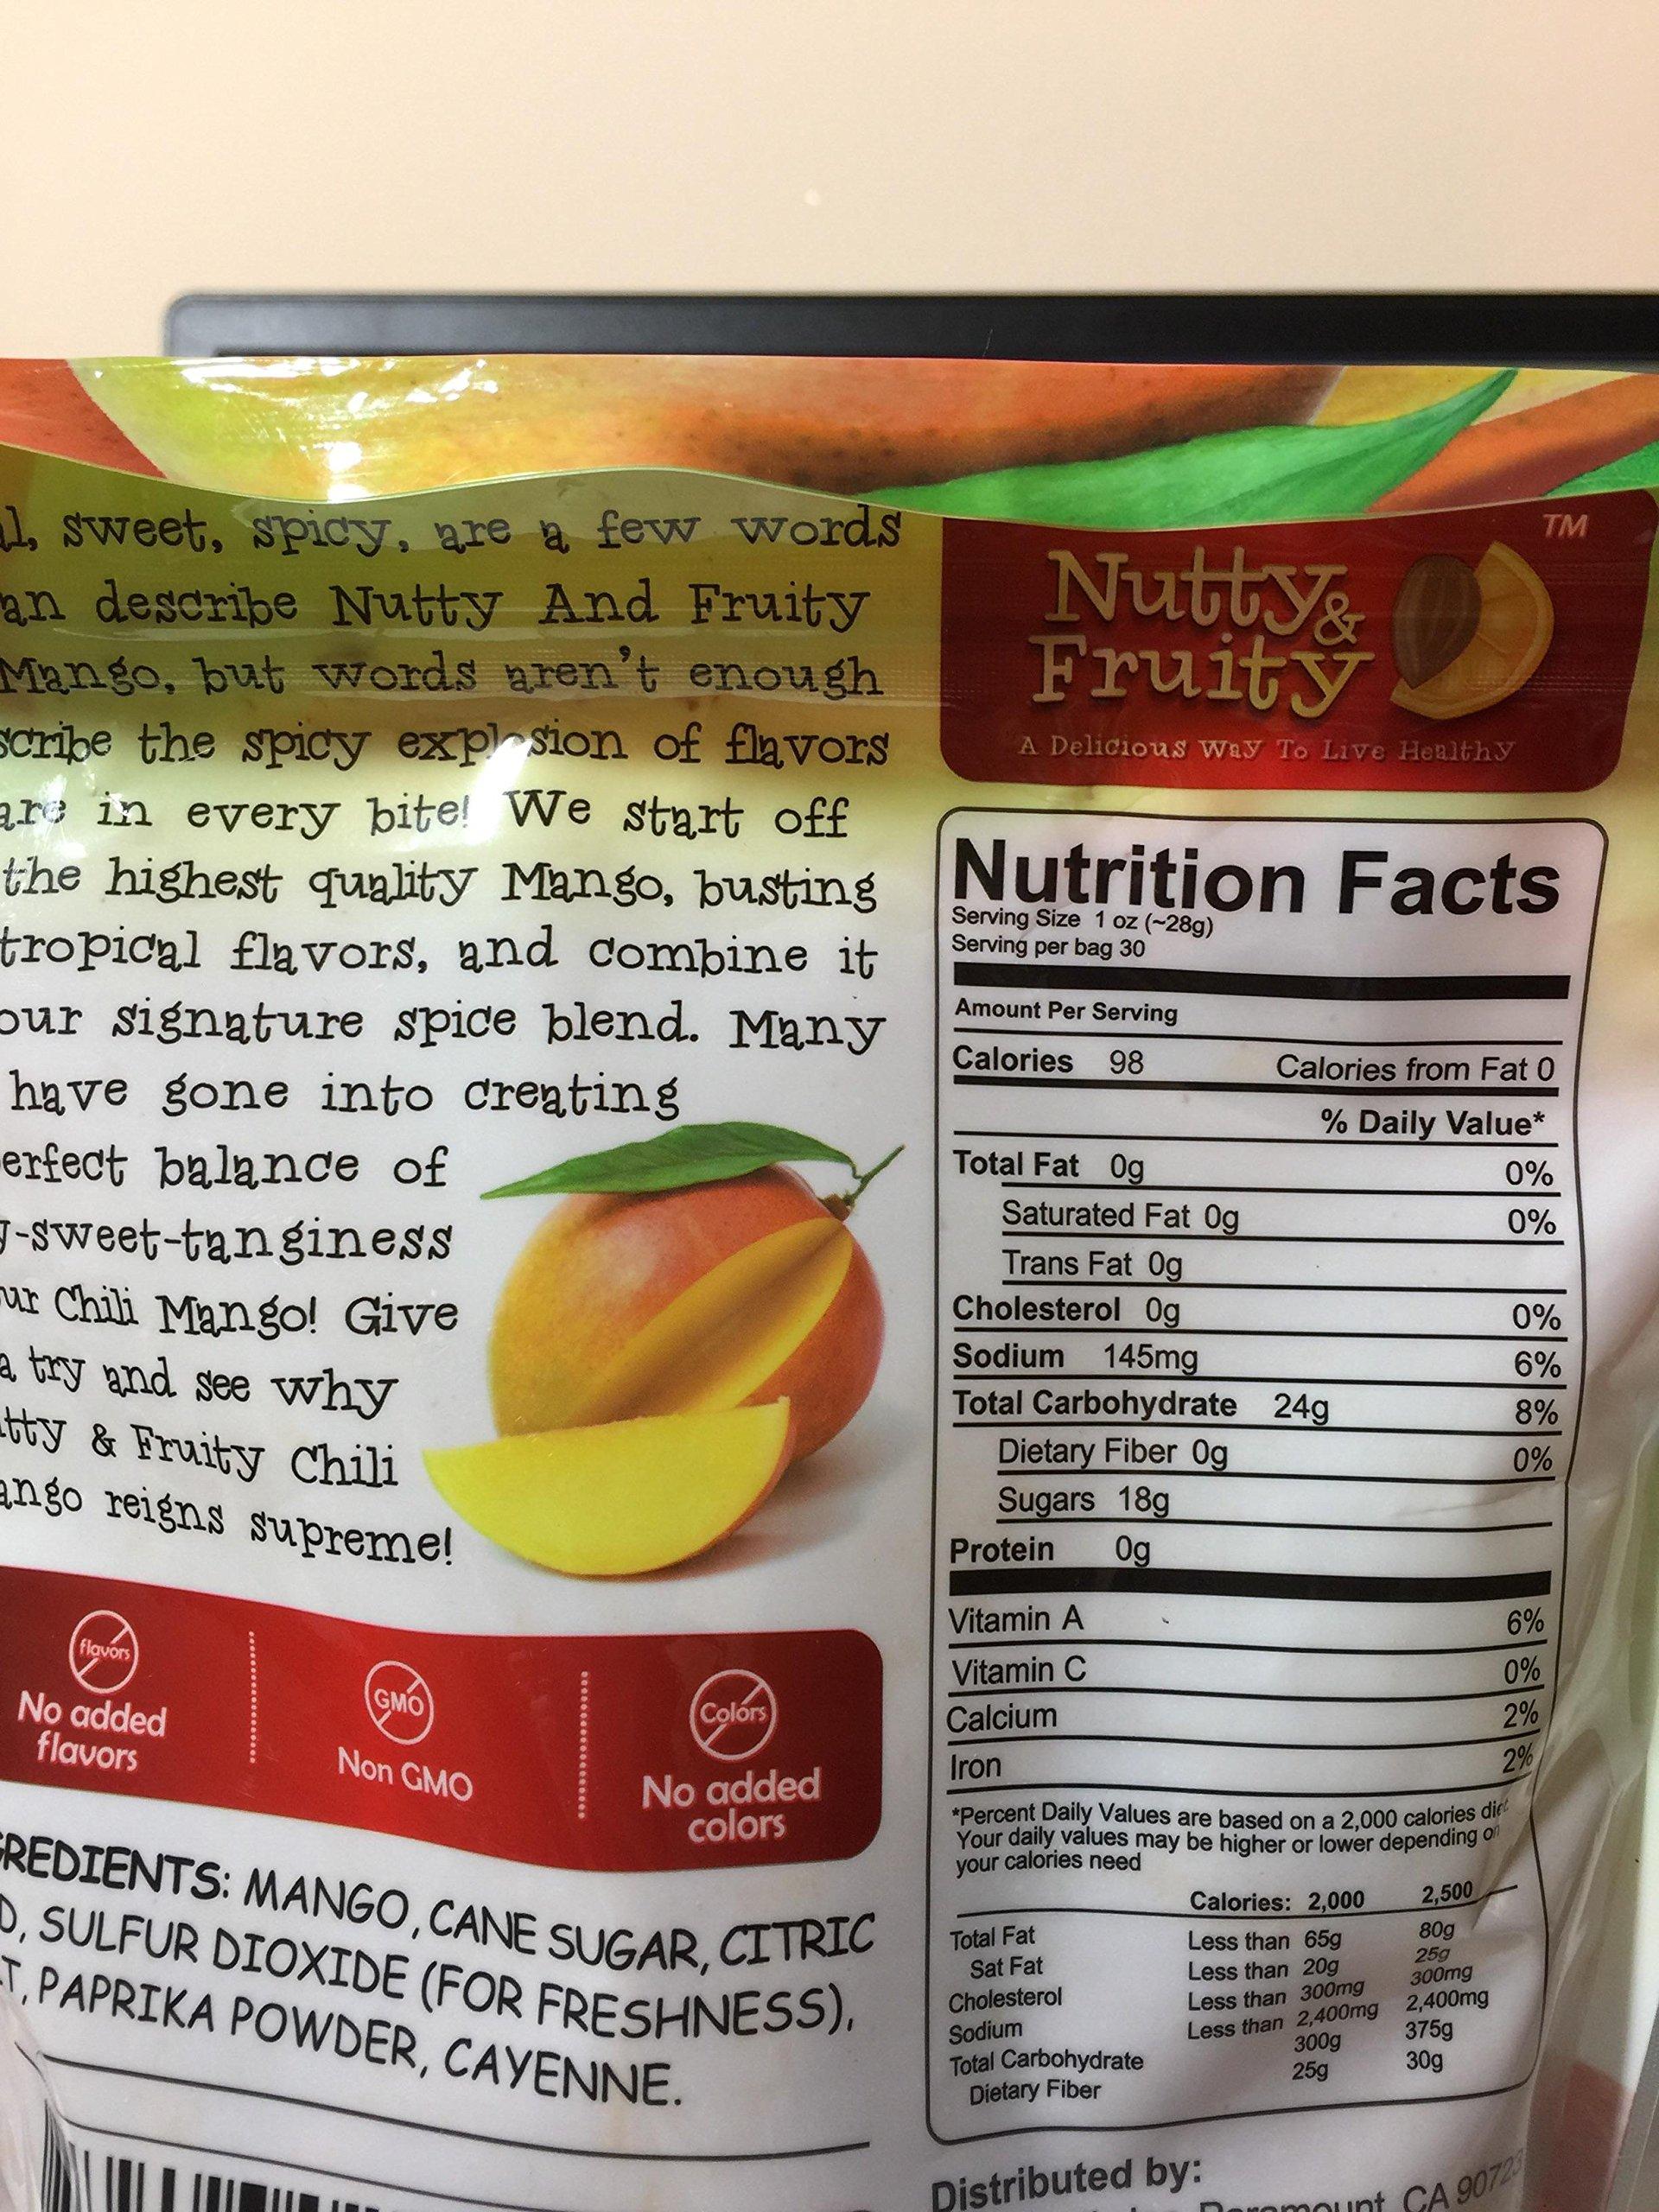 Nutty & fruity chili mango gourmet dried fruit 30 oz. (850g) by Nutty& fruity (Image #2)